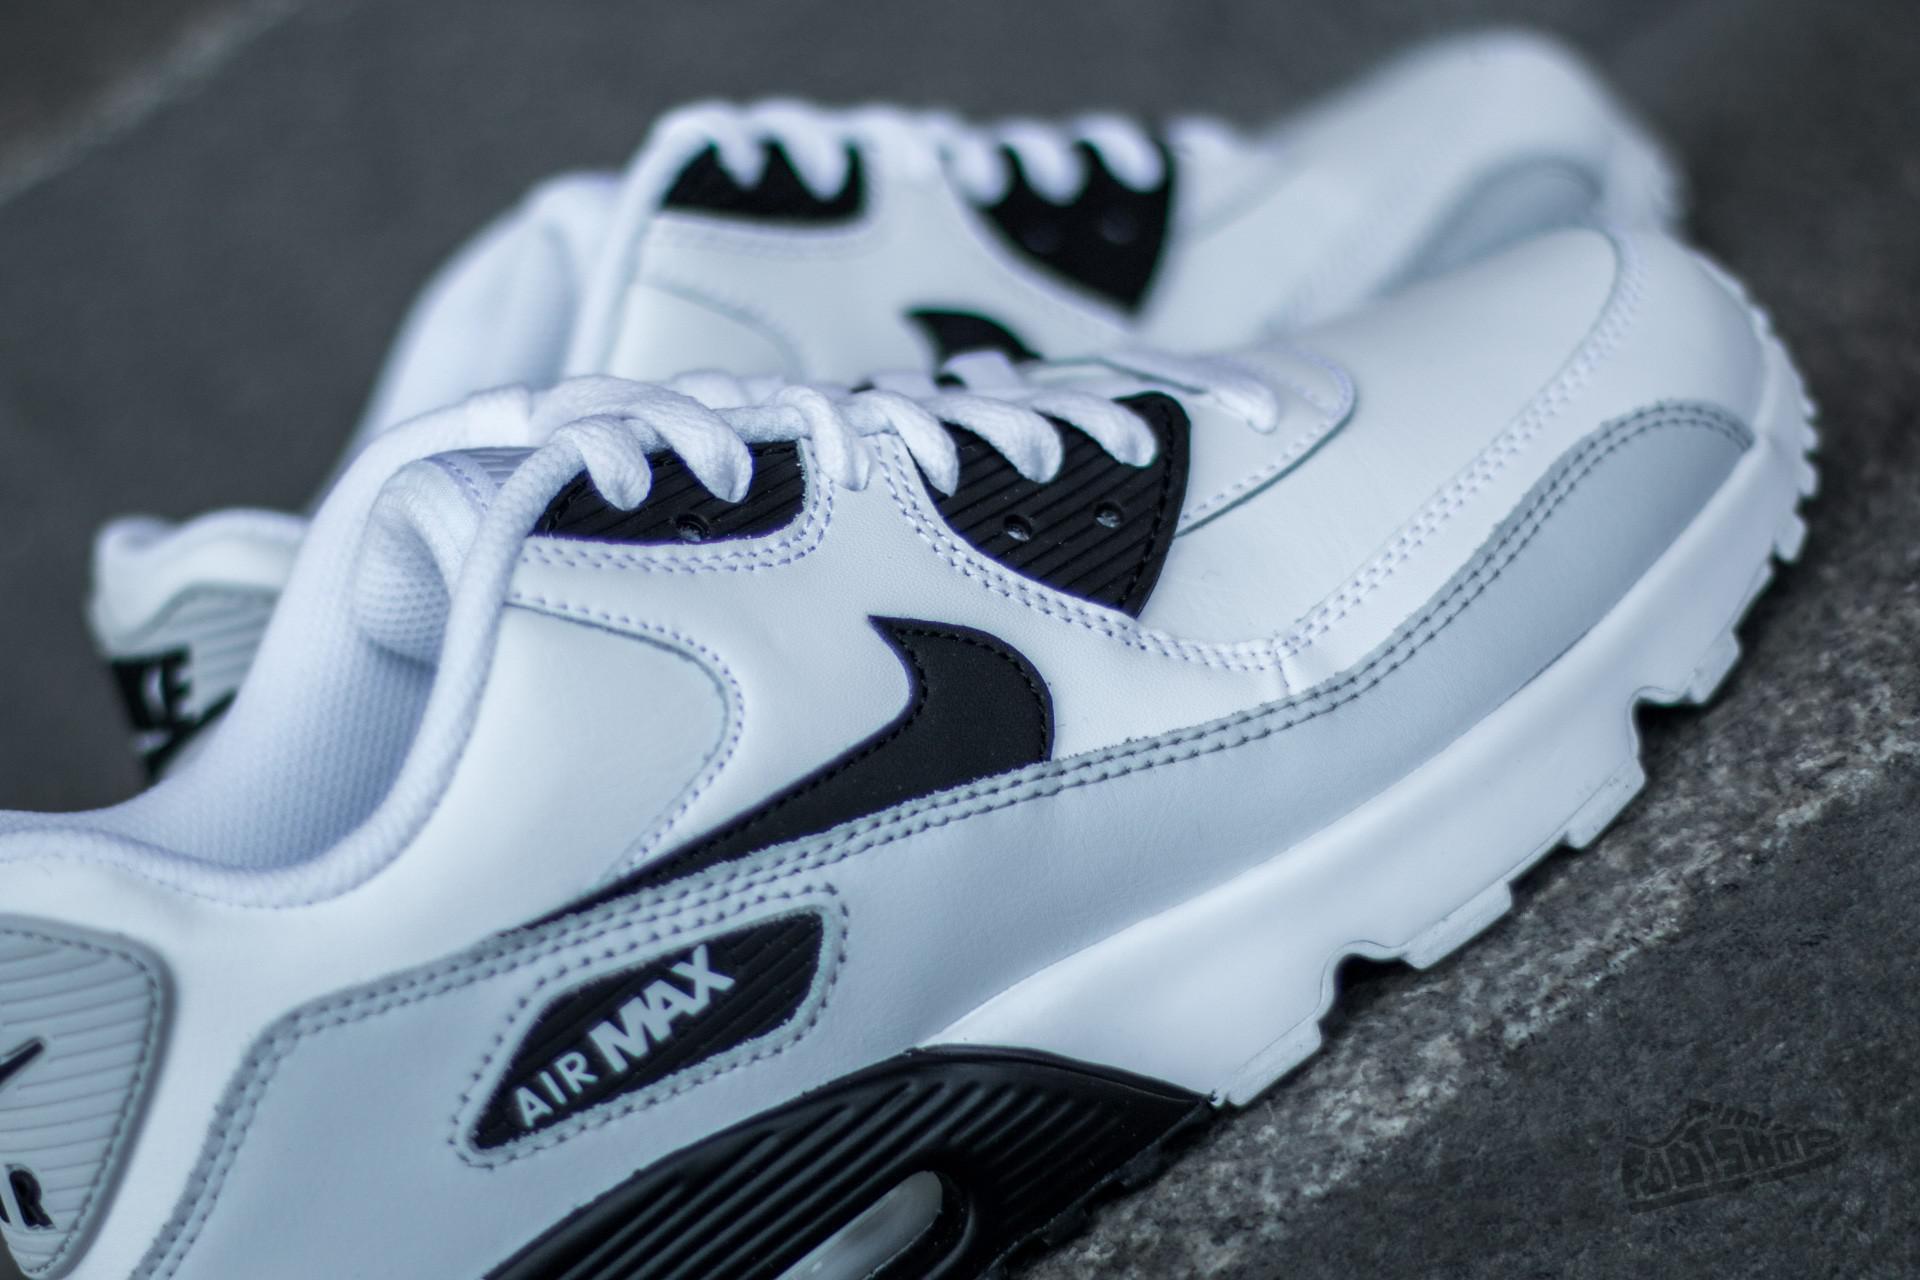 Lyst - Nike Air Max 90 Ltr (gs) White  Black-pure Platinum-white in ... 1e018859b